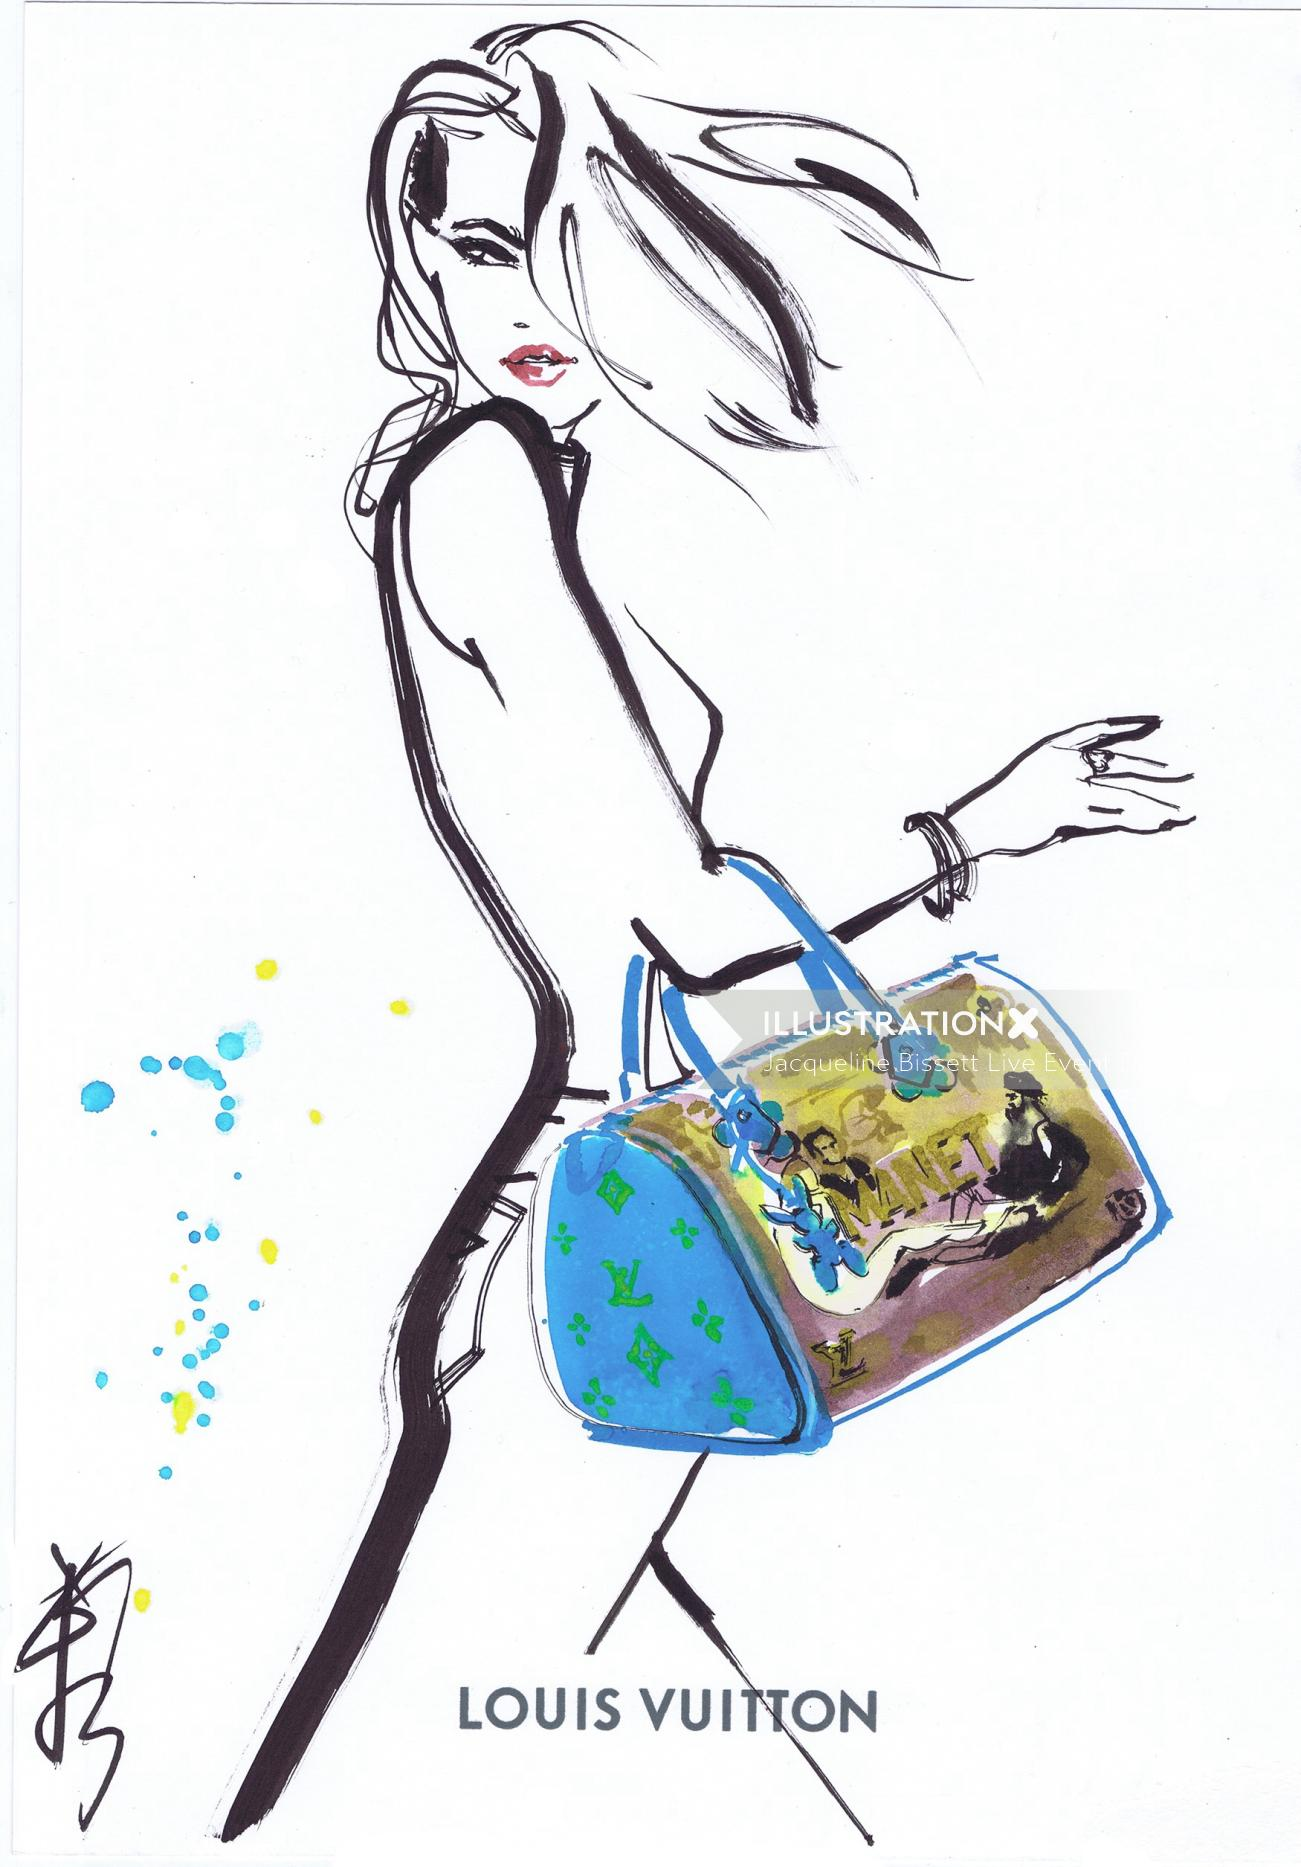 Louis Vuitton stylish bag